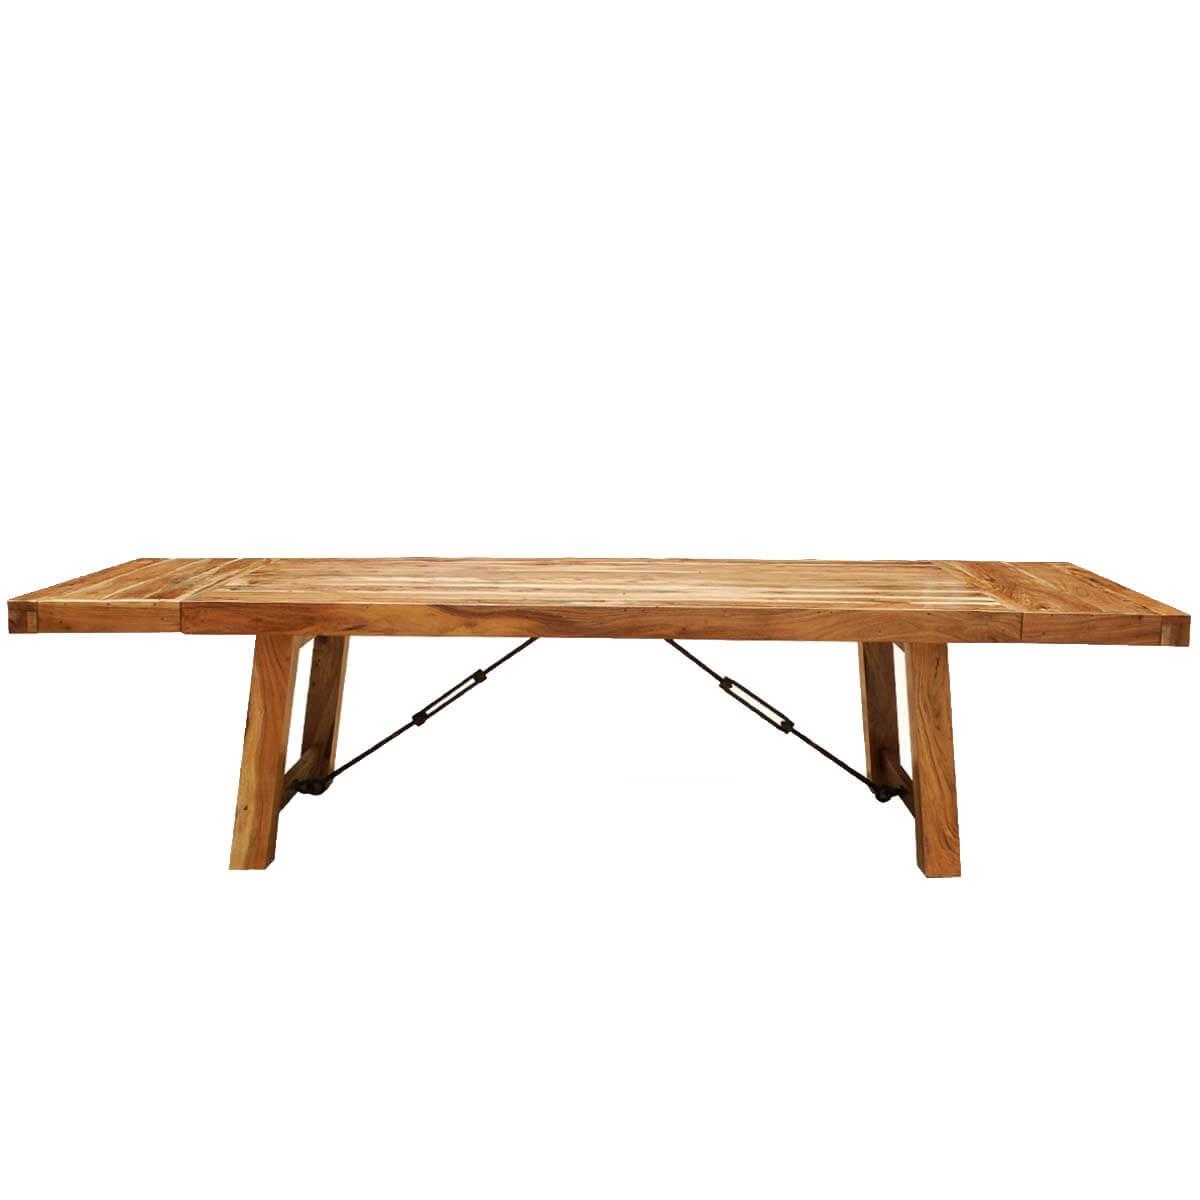 Rustic wood large santa fe dining room table w extensions for Dining room tables with extensions